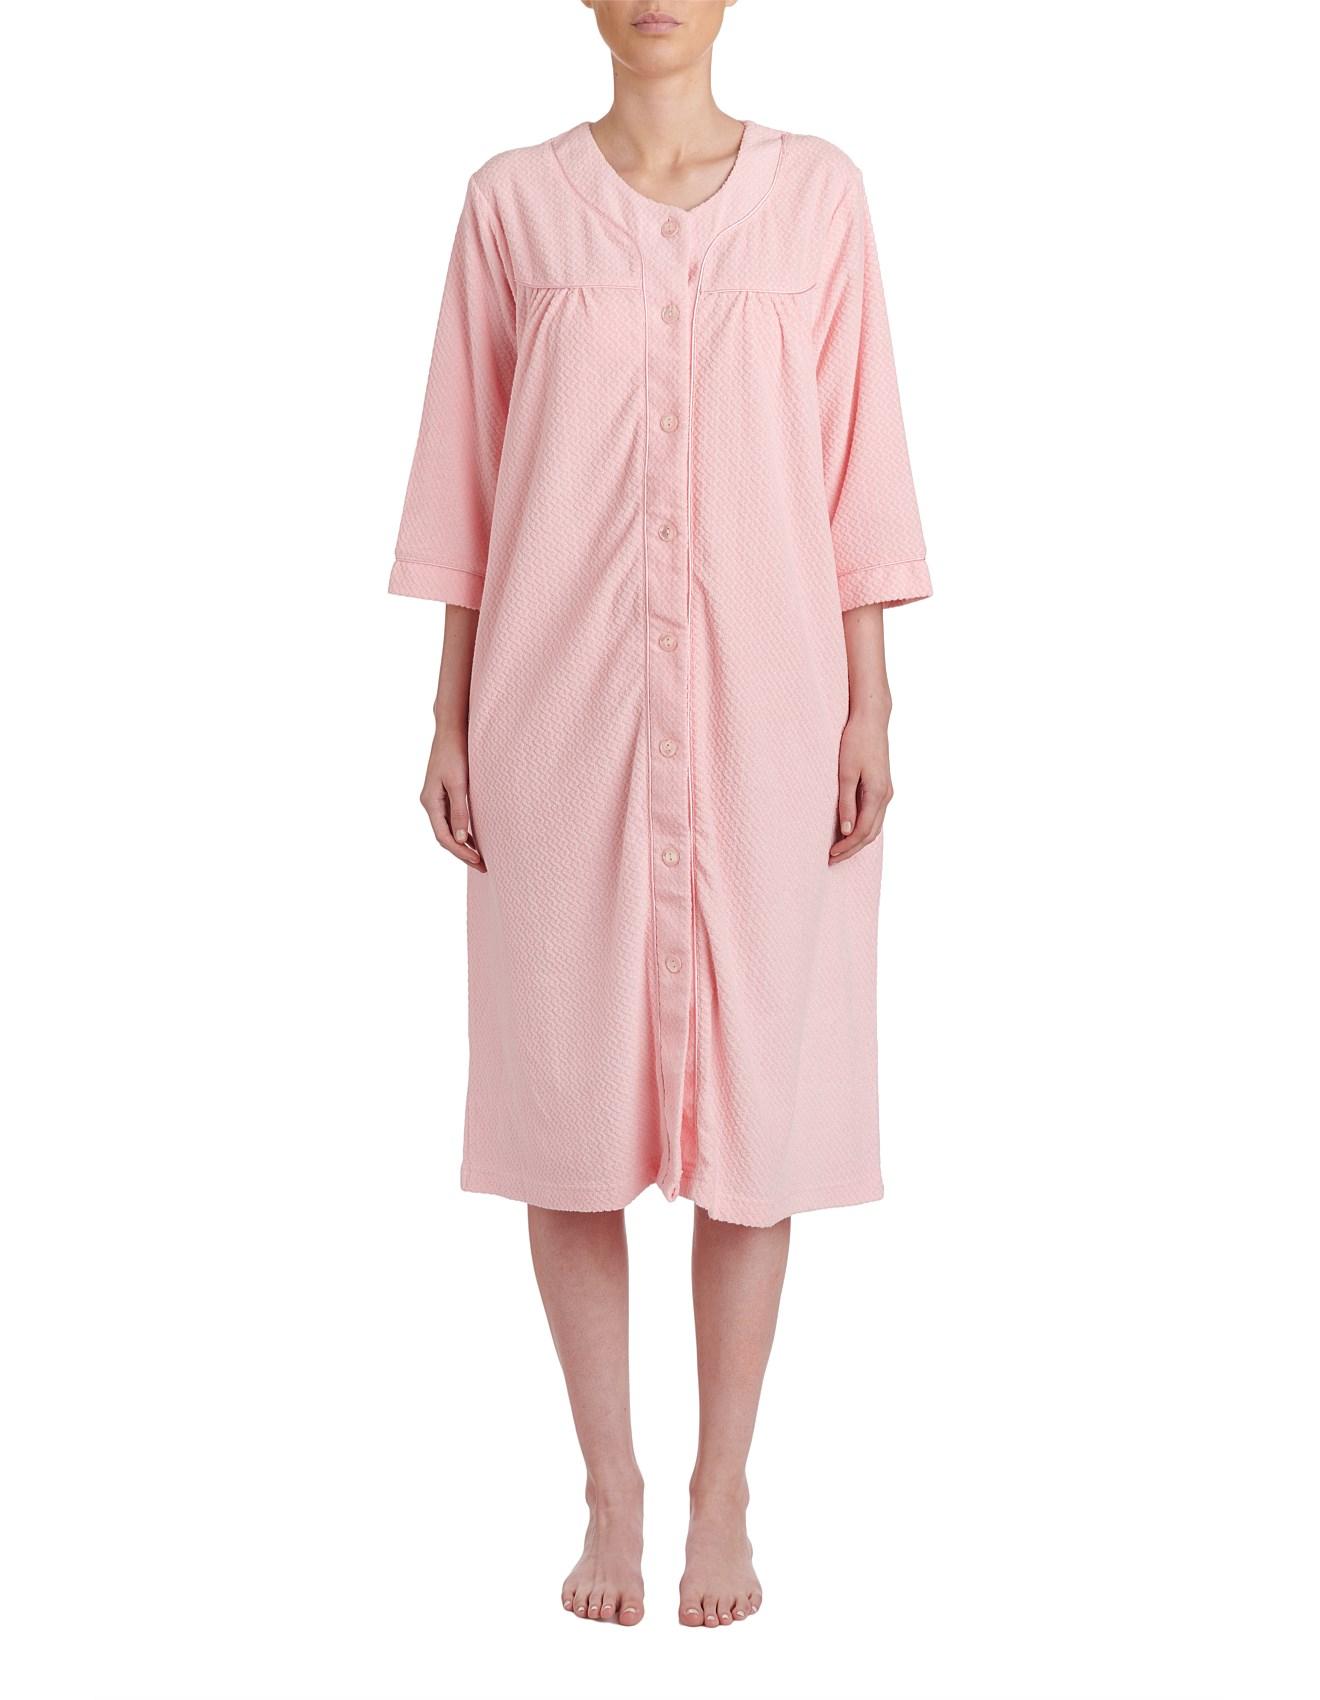 Women - 3/4 Sleeve Gown